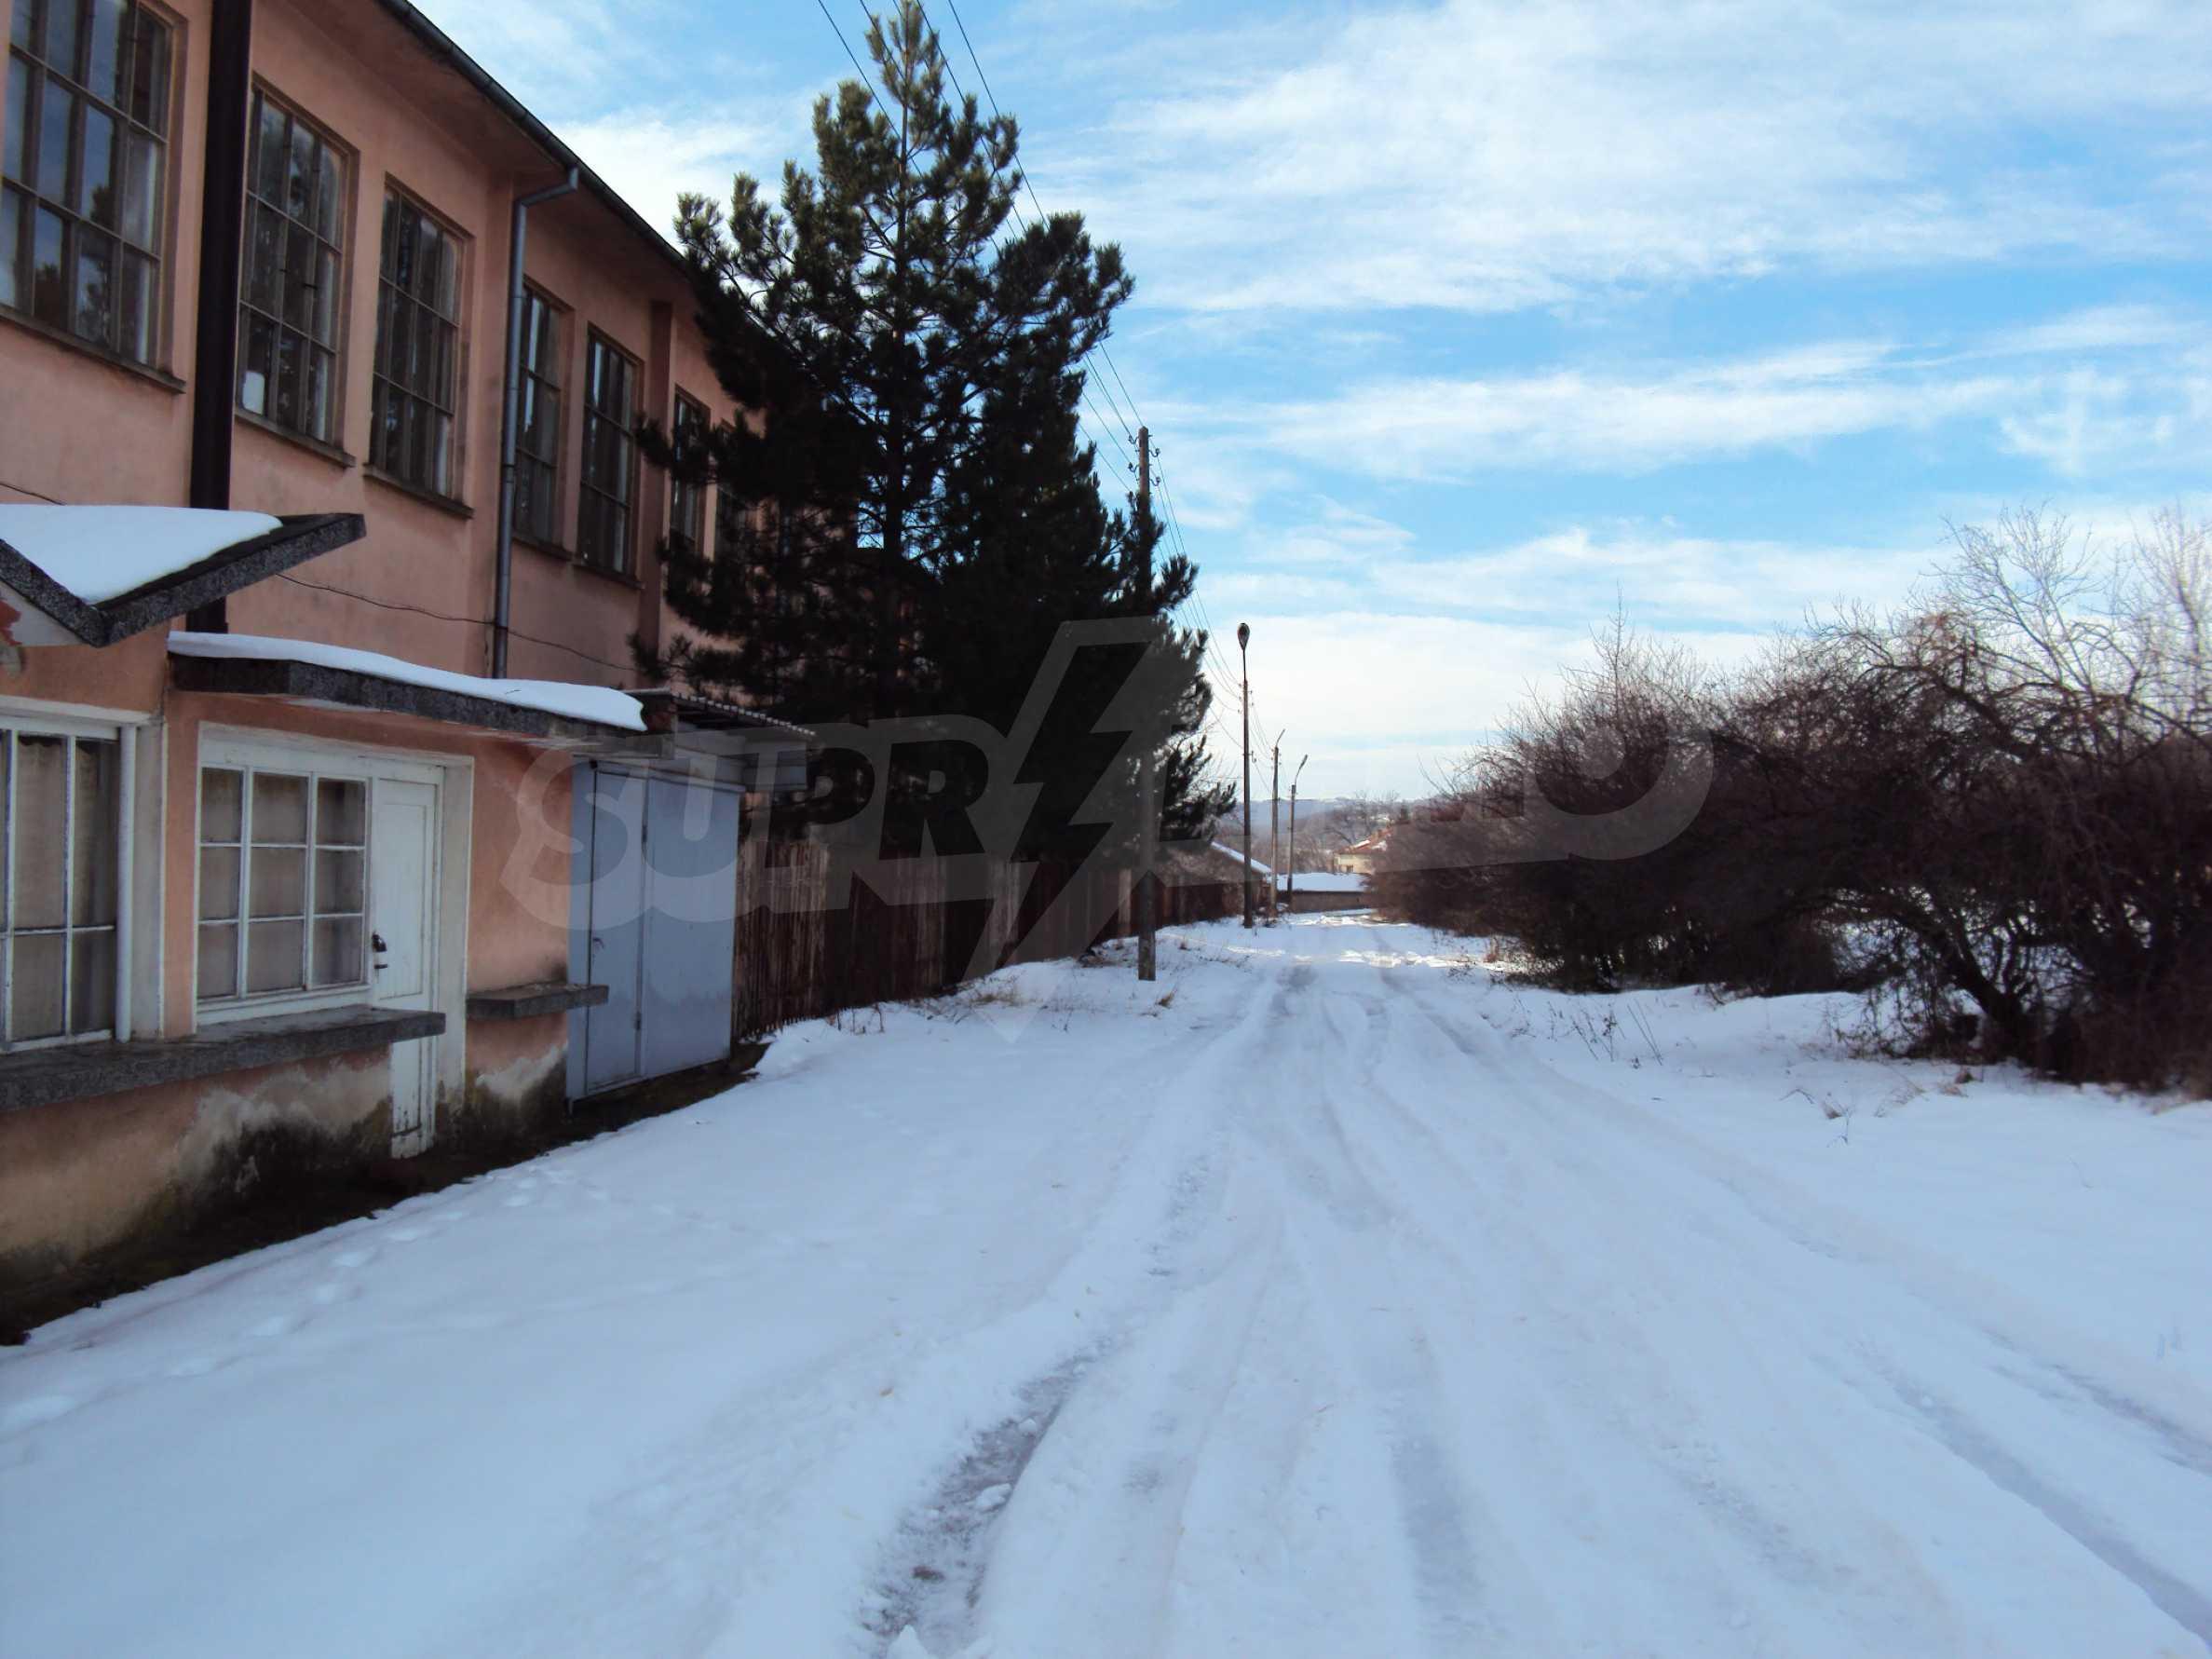 Fabrik in der Nähe von Veliko Tarnovo 26